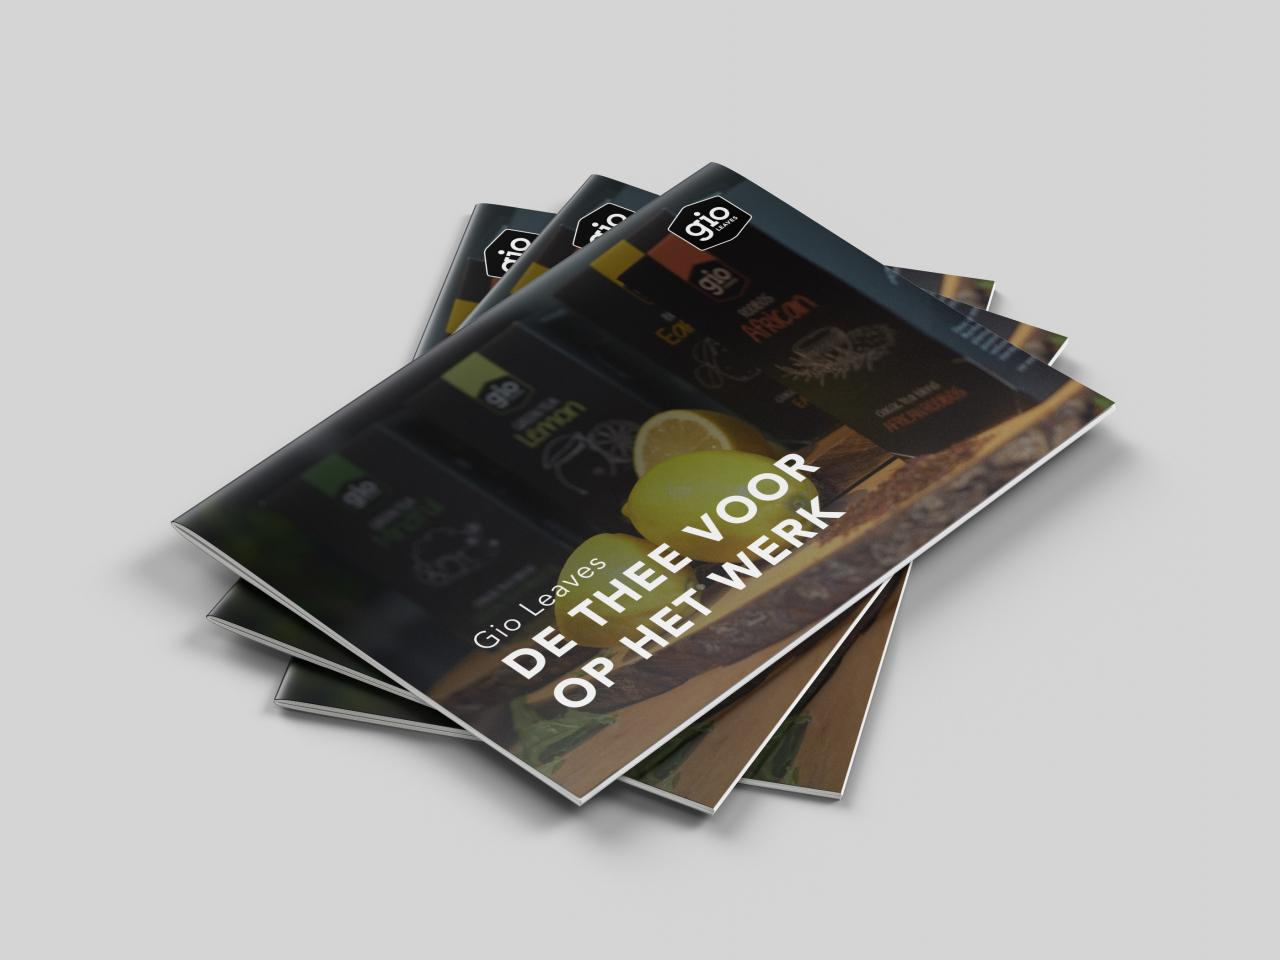 Brochure: Gio Leaves - Thee Voor Op Het Werk